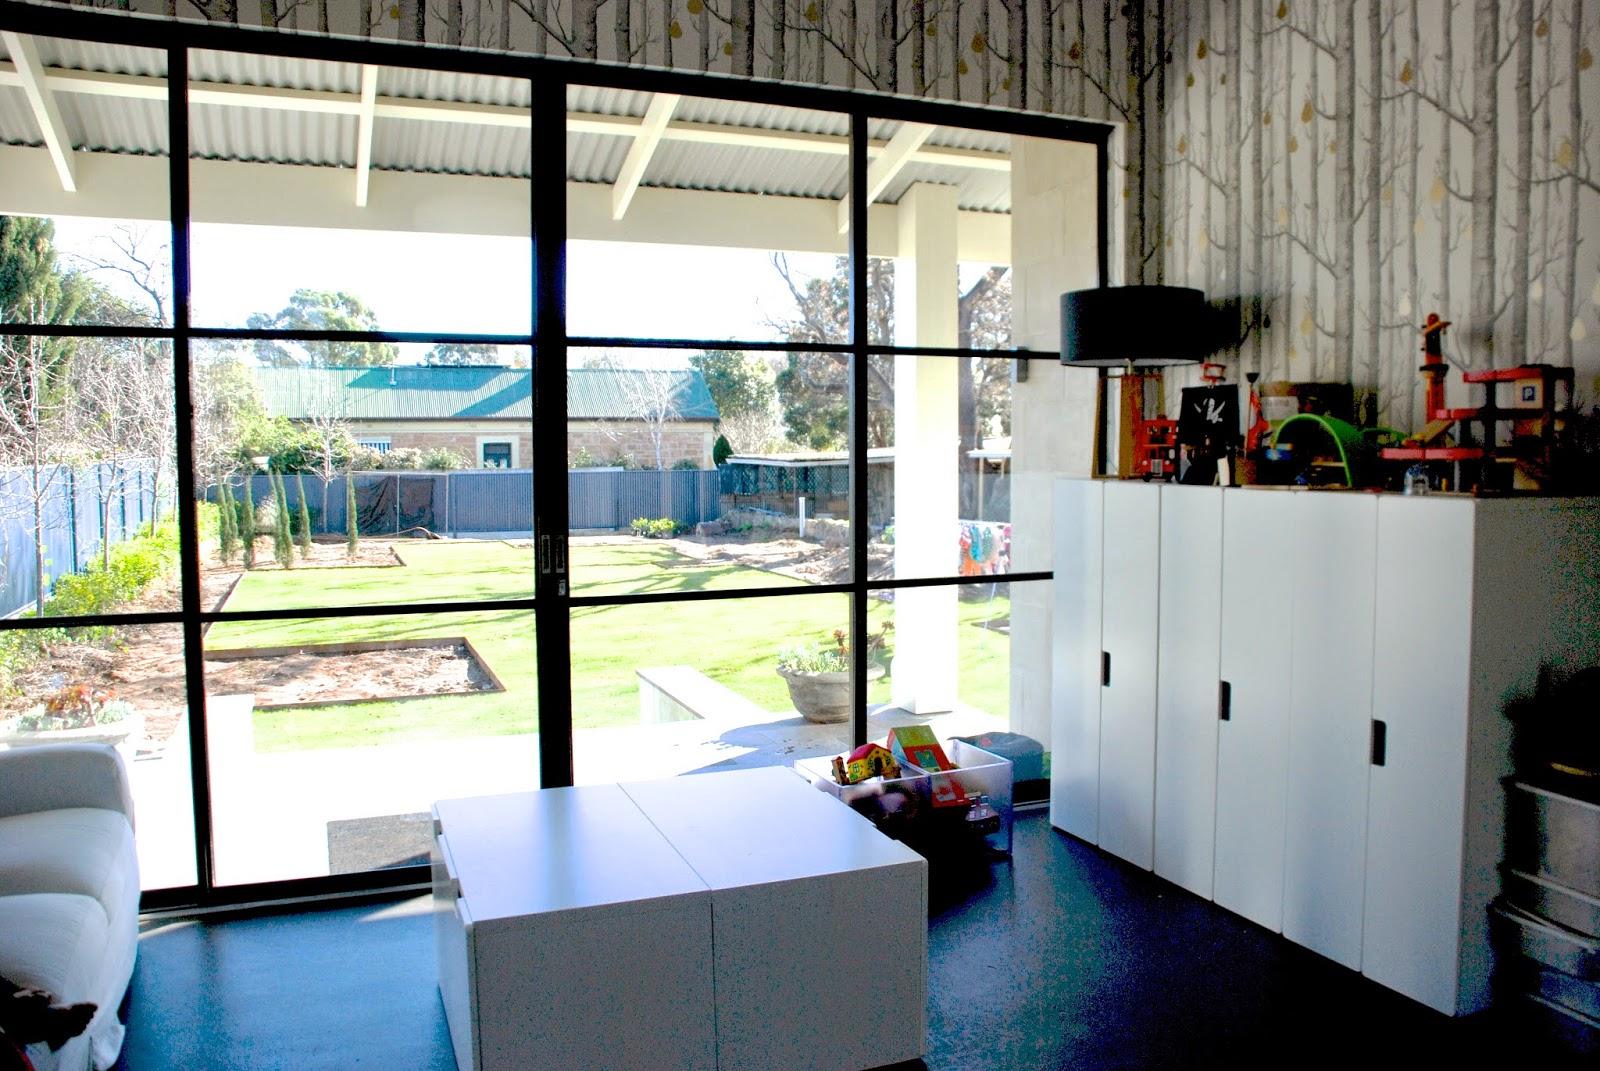 Adelaide villa steel windows all your questions answered steel windows all your questions answered rubansaba